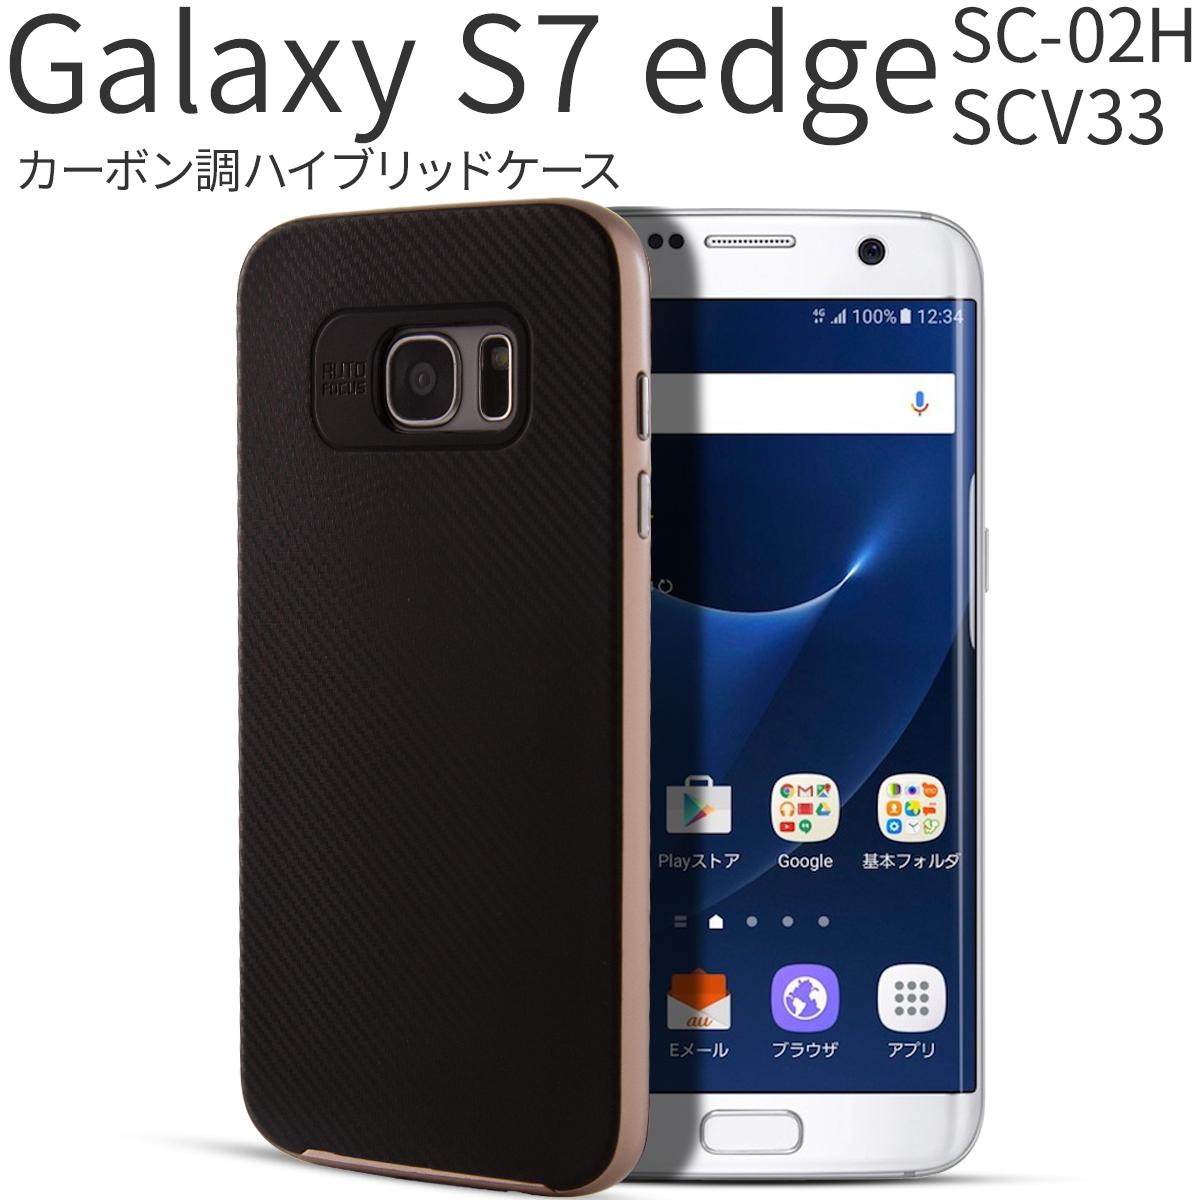 Galaxy S7 edge SC-02H/SCV33 ハイブリッドケース